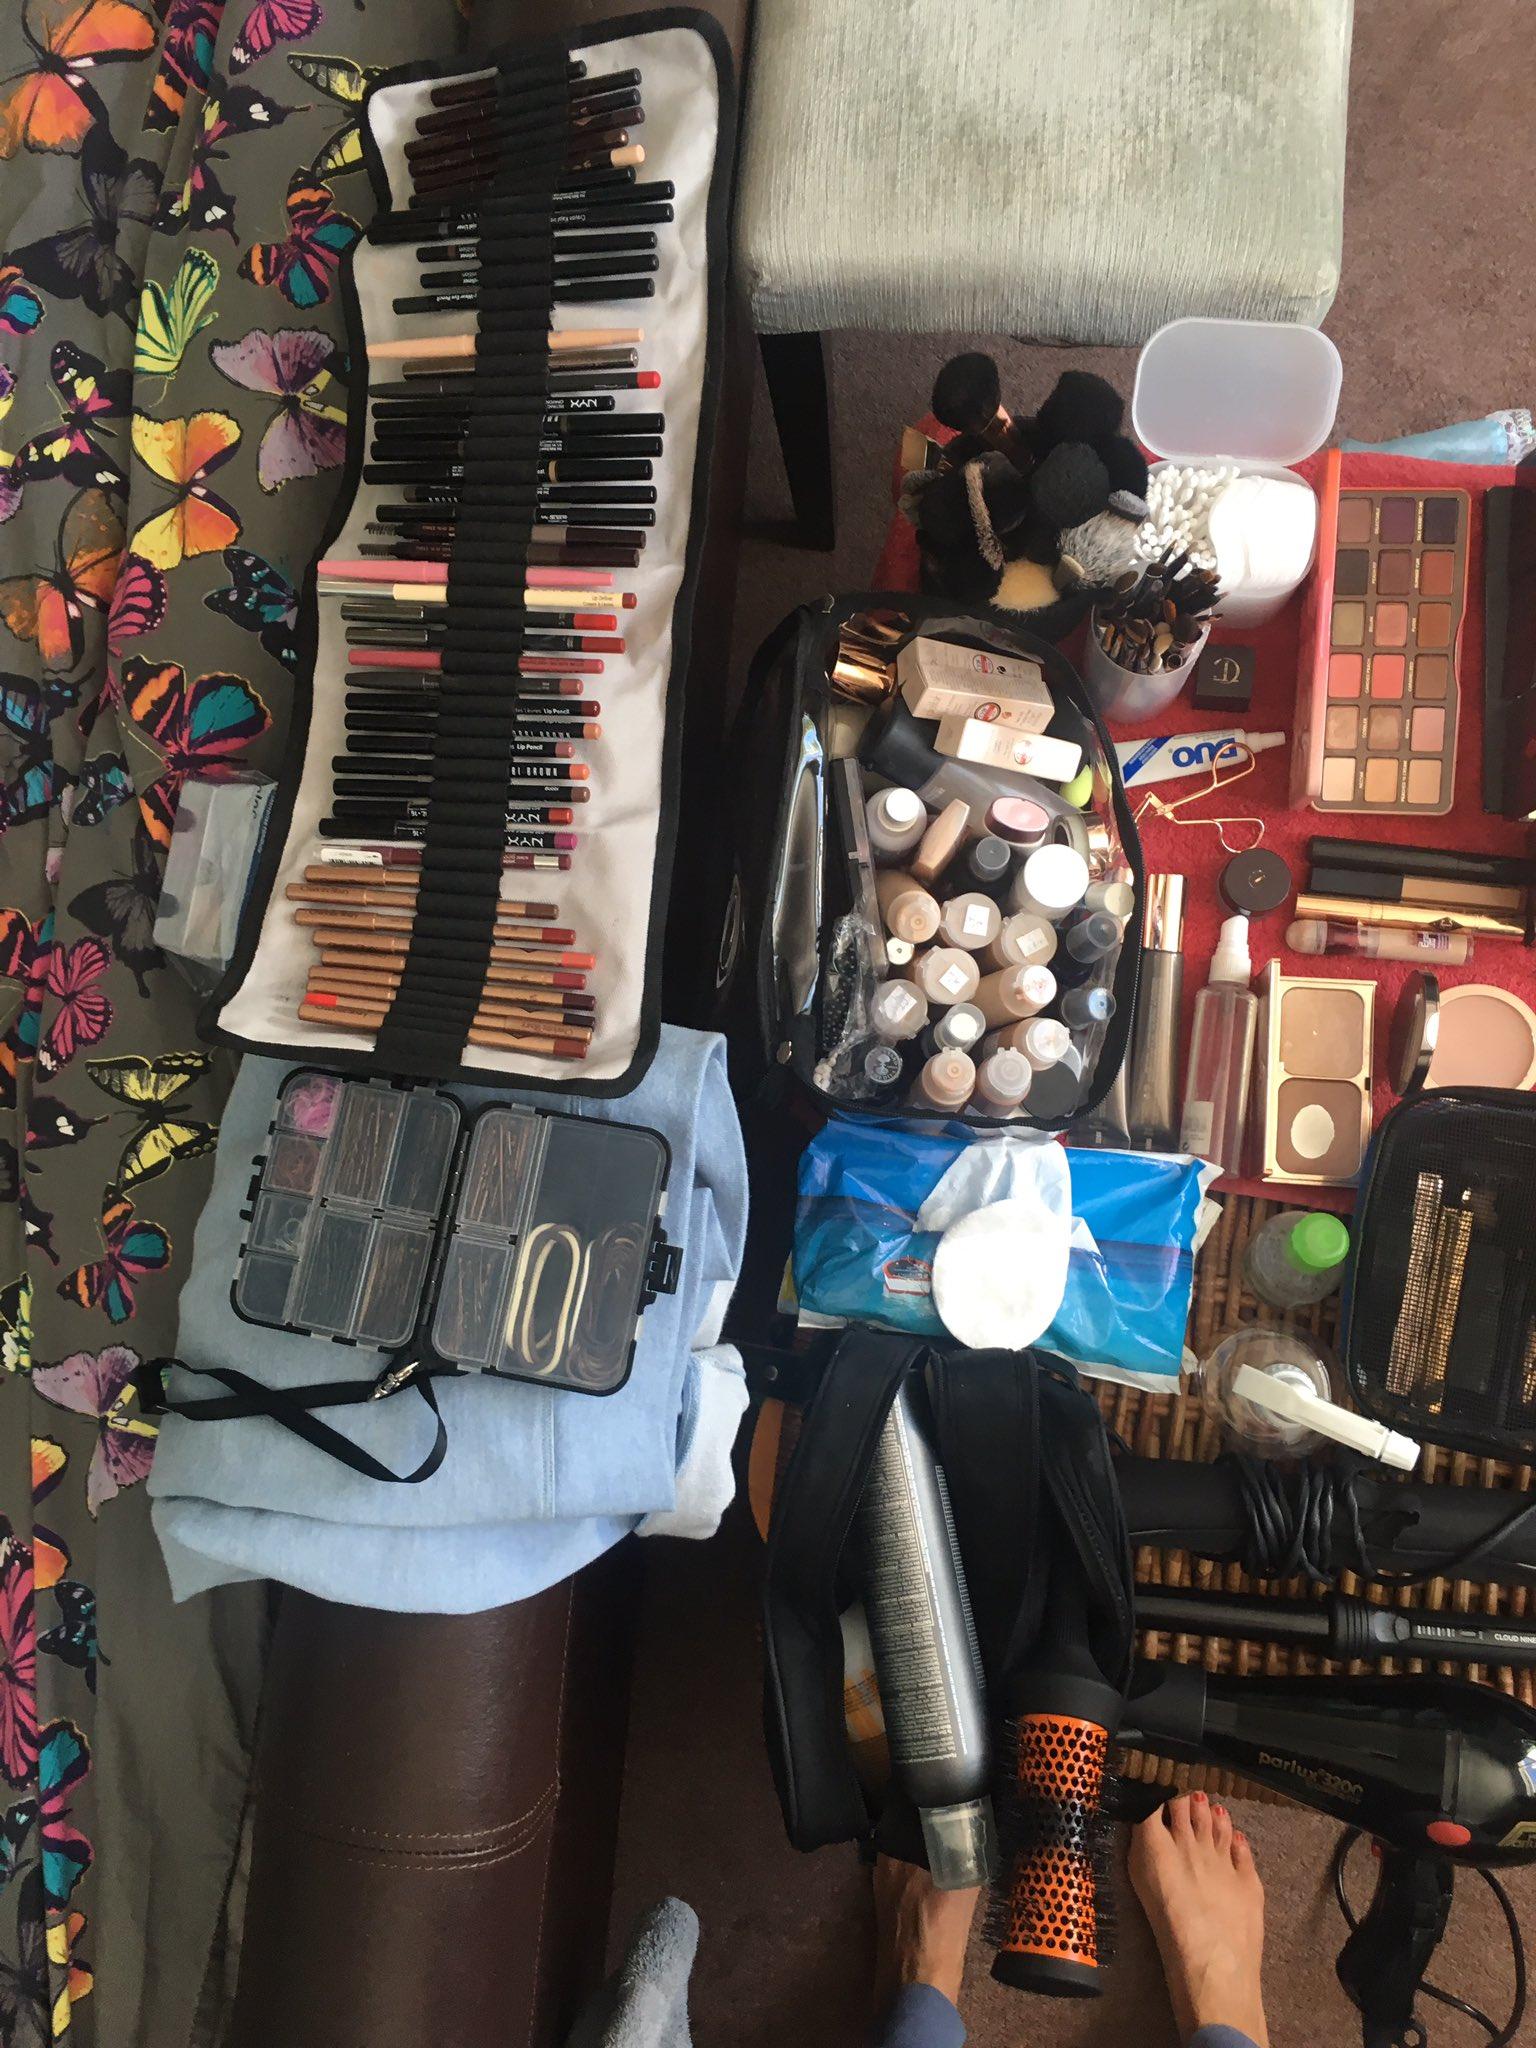 Let the renovations begin!! #glamourawards https://t.co/RKTO9j5PZ3